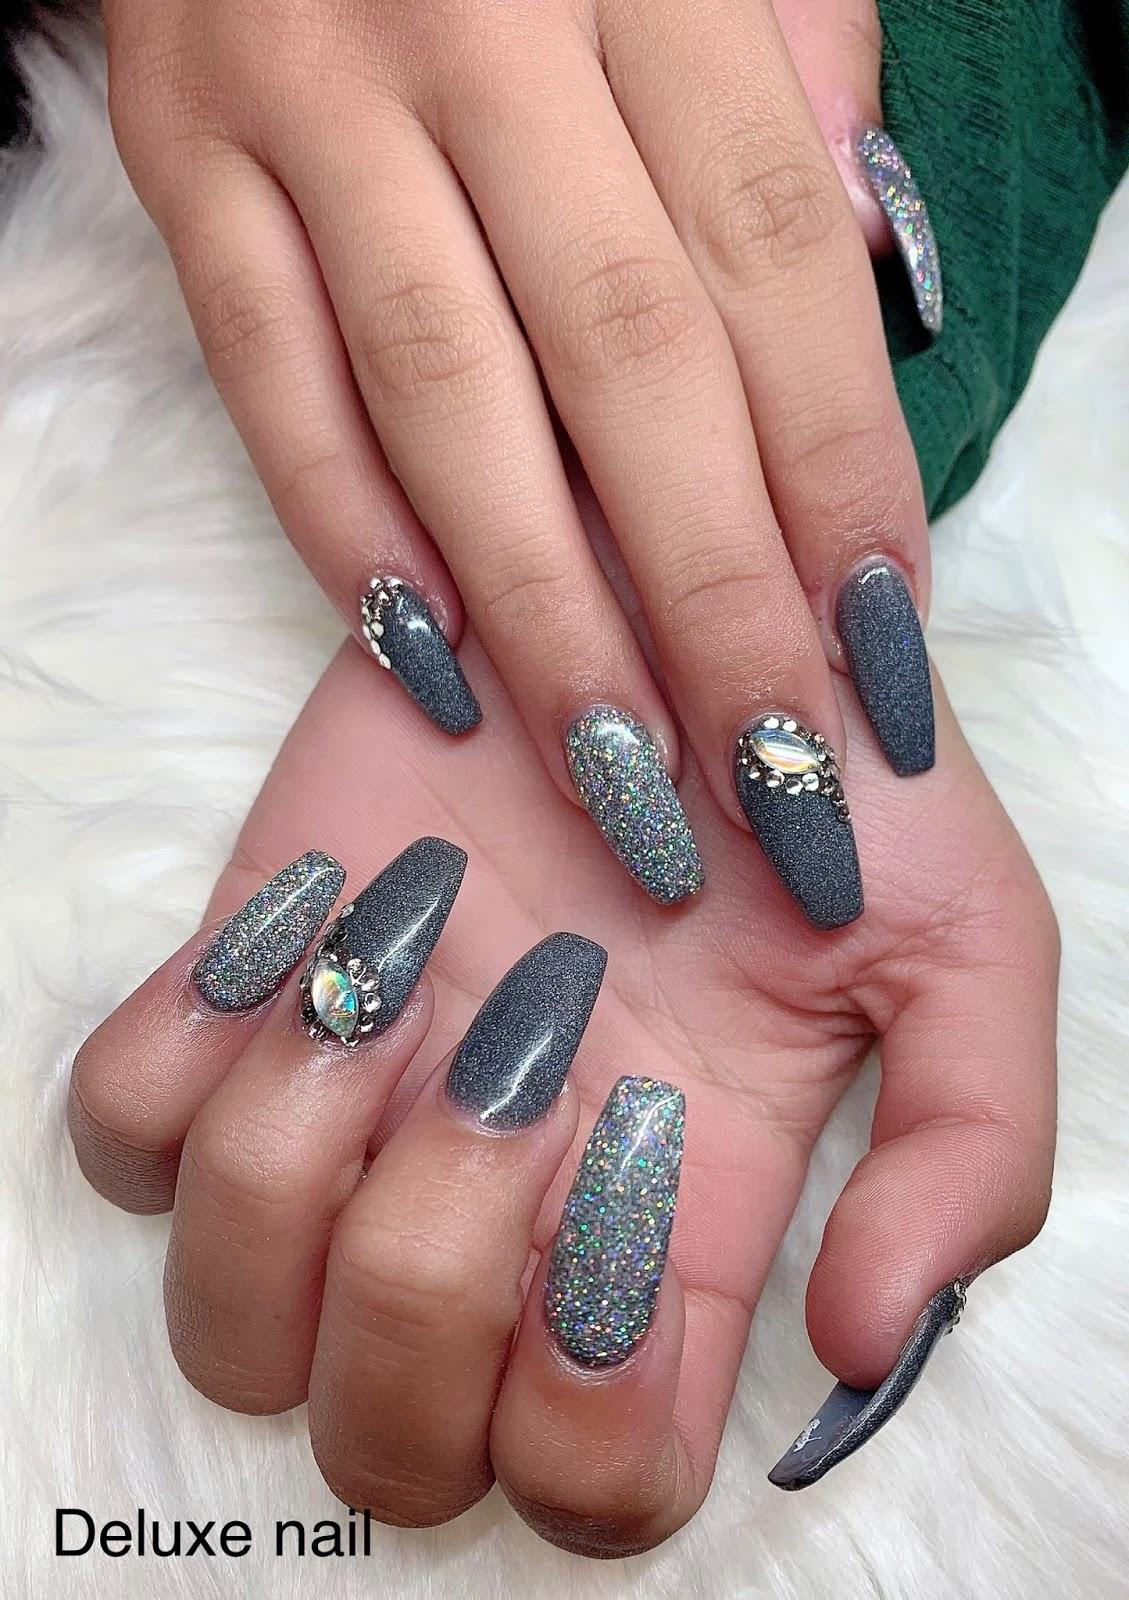 Deluxe Nails Madeira : deluxe, nails, madeira, Deluxe, Nails, Asgardbanduae